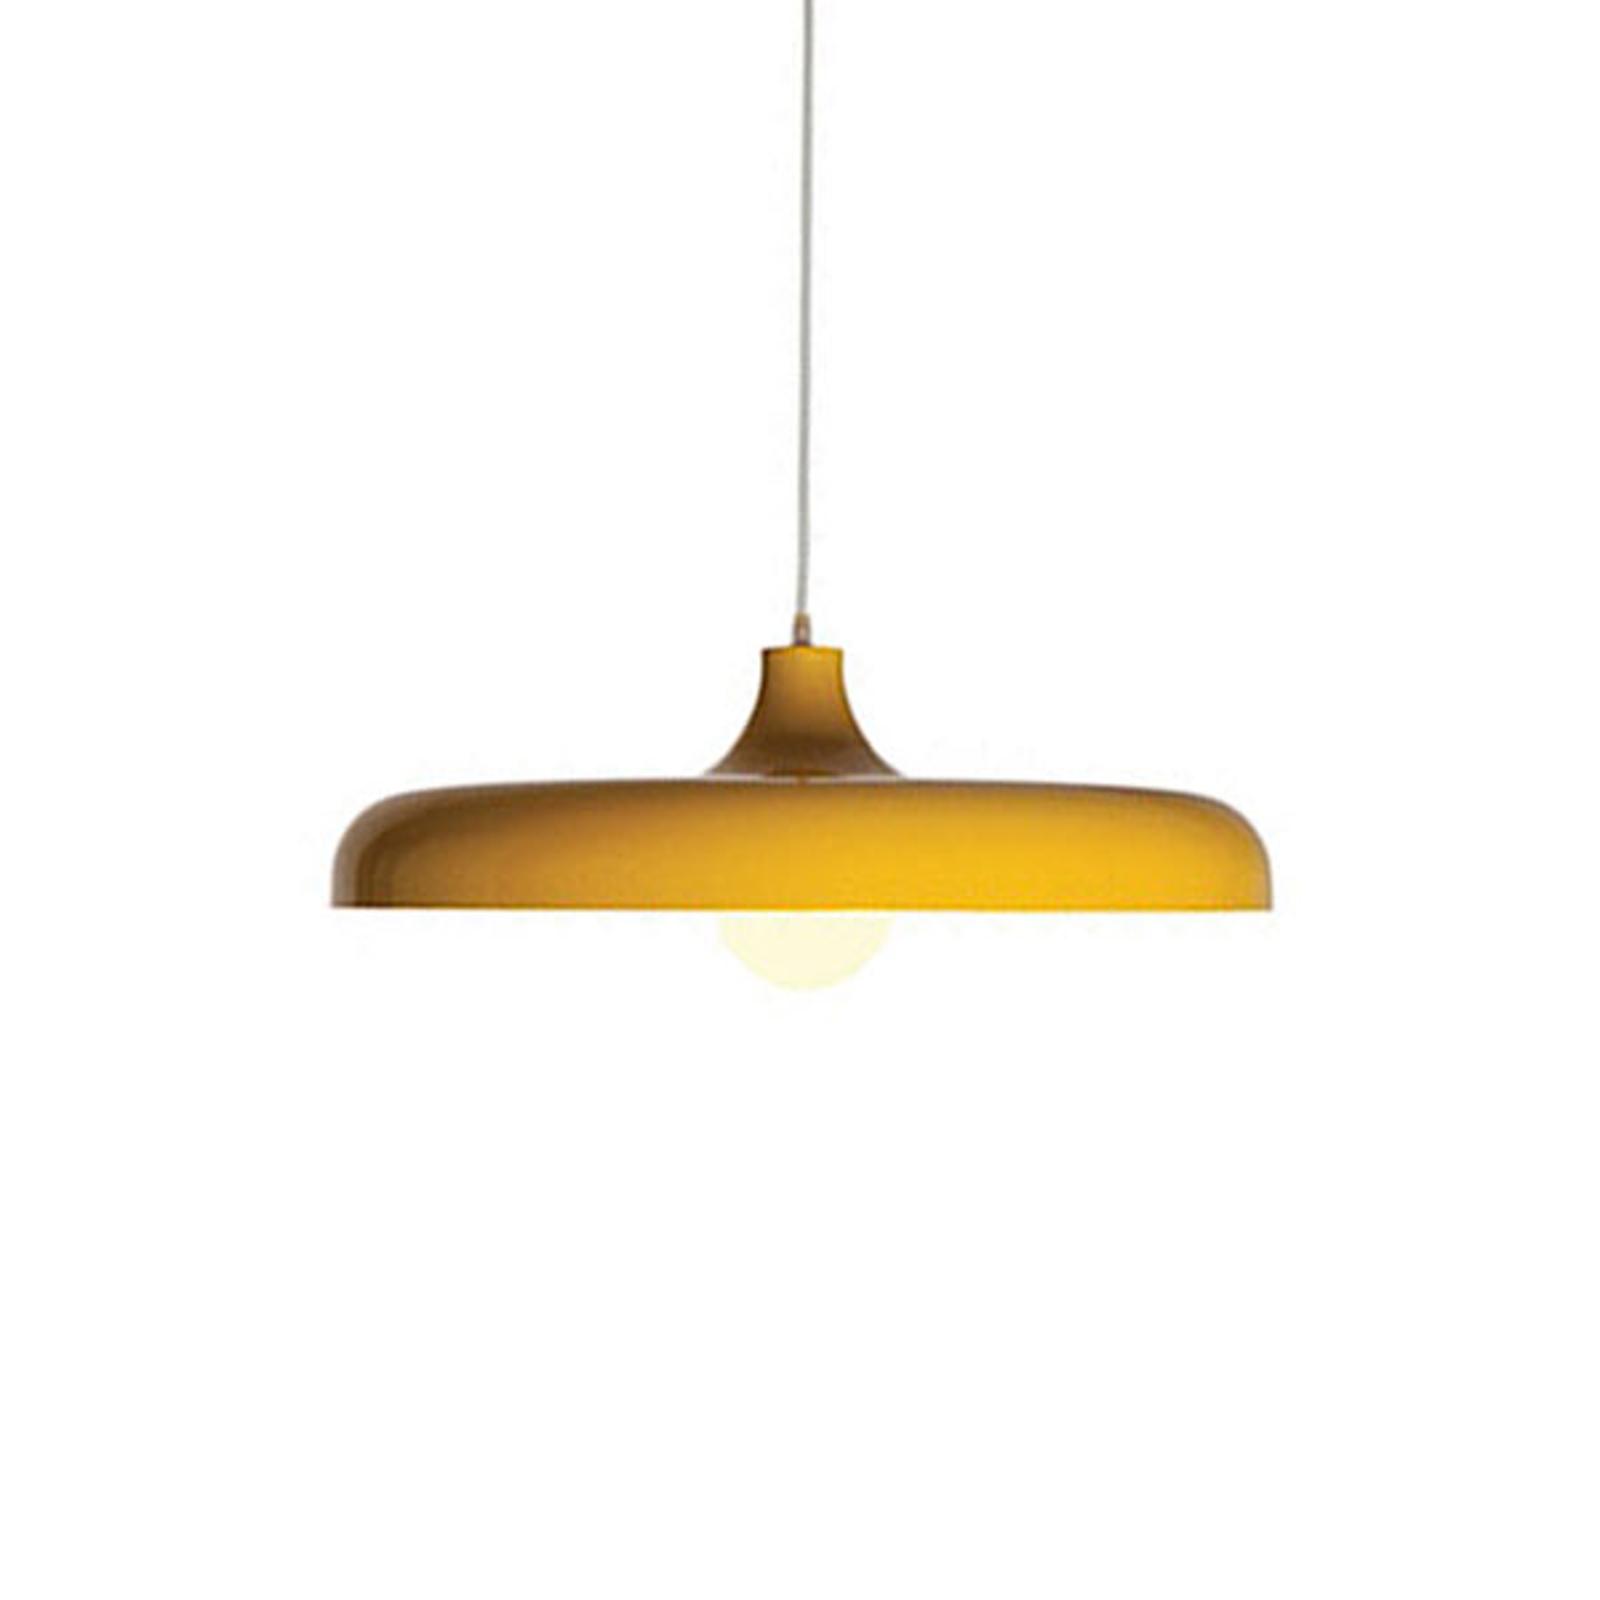 Innermost Portobello - Hanglamp Ø 49cm geel